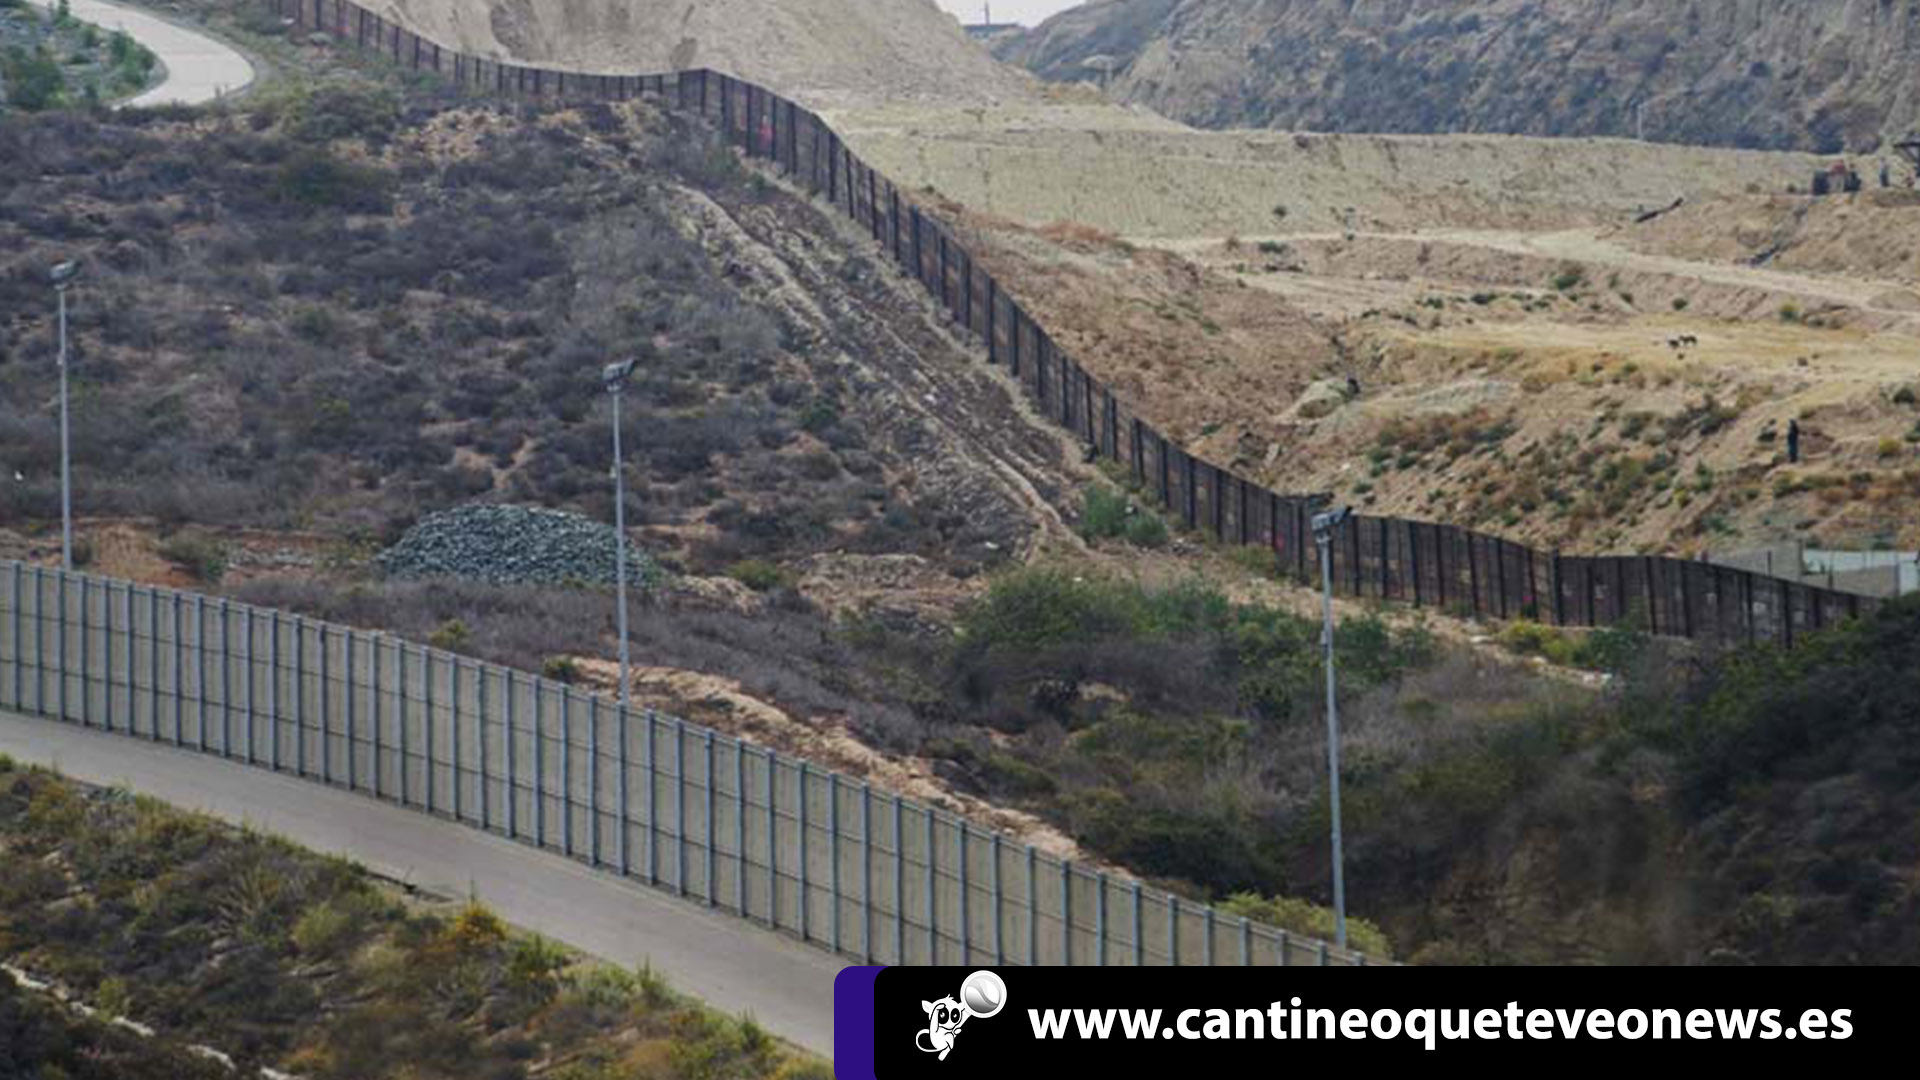 Trump amenaza frontera de México - Mexico - Cantineoqueteveo news